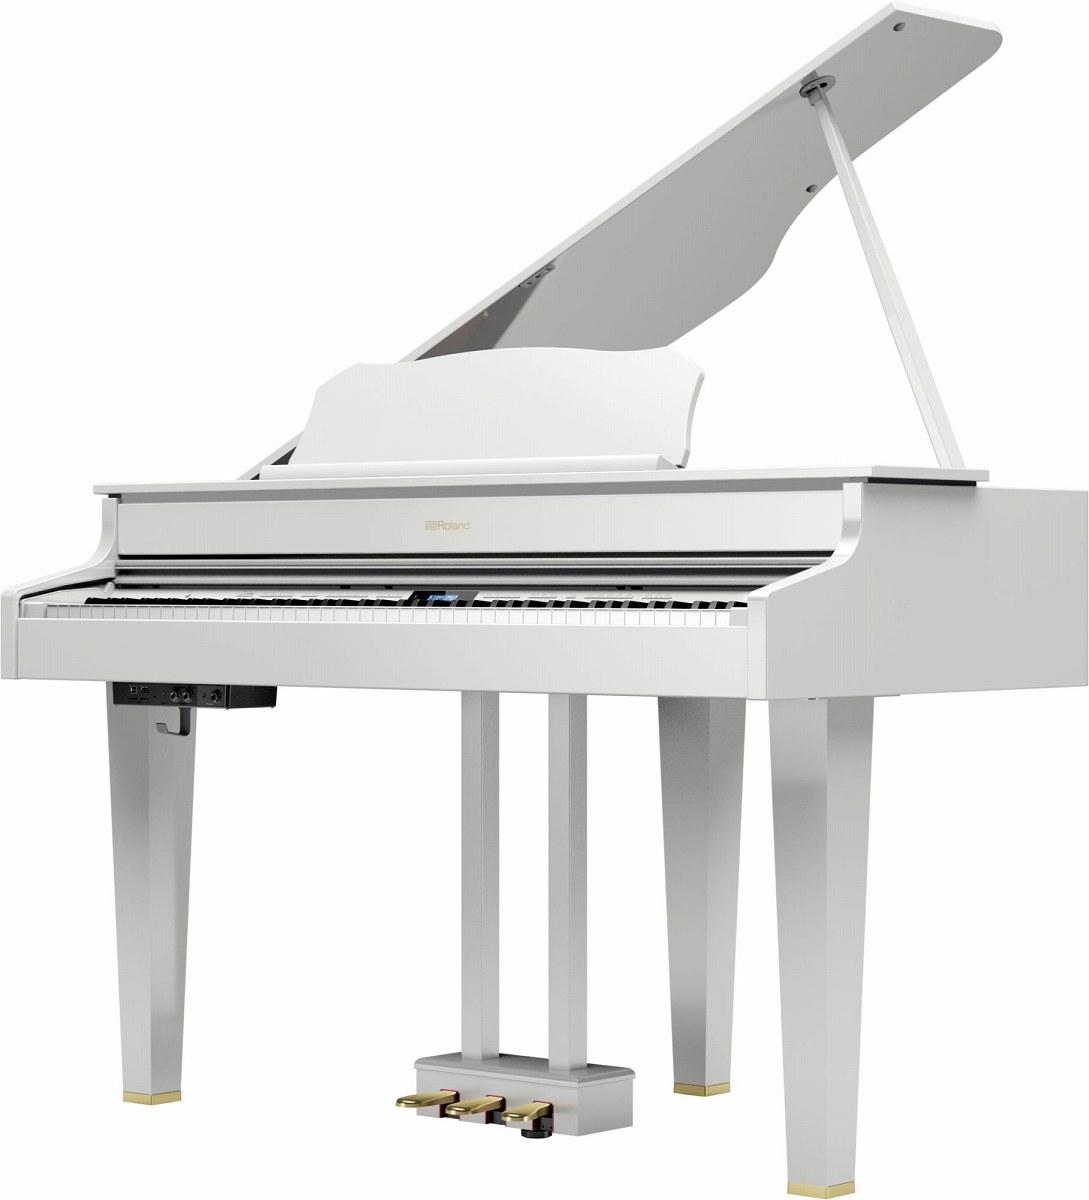 Roland ローランド / GP607 PWS 白塗鏡面塗装仕上げ 電子ピアノ (GP-607)(GP607-PWS)【全国組立設置無料】【代引き不可】【YRK】【PTNB】《予約注文/11月下旬入荷予定》